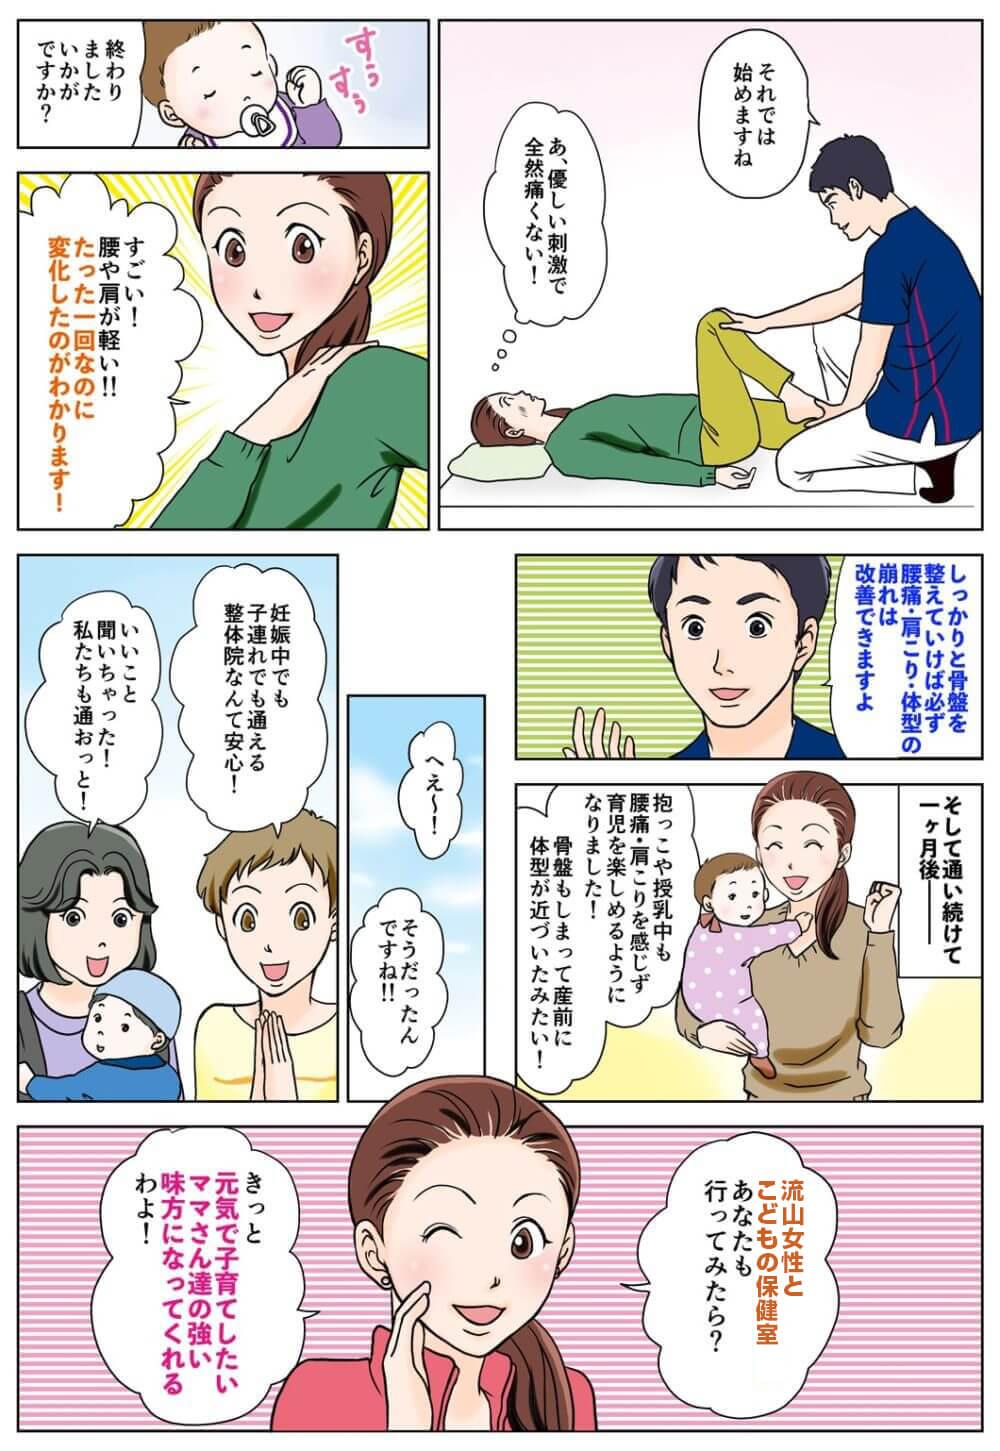 PCマンガページ4